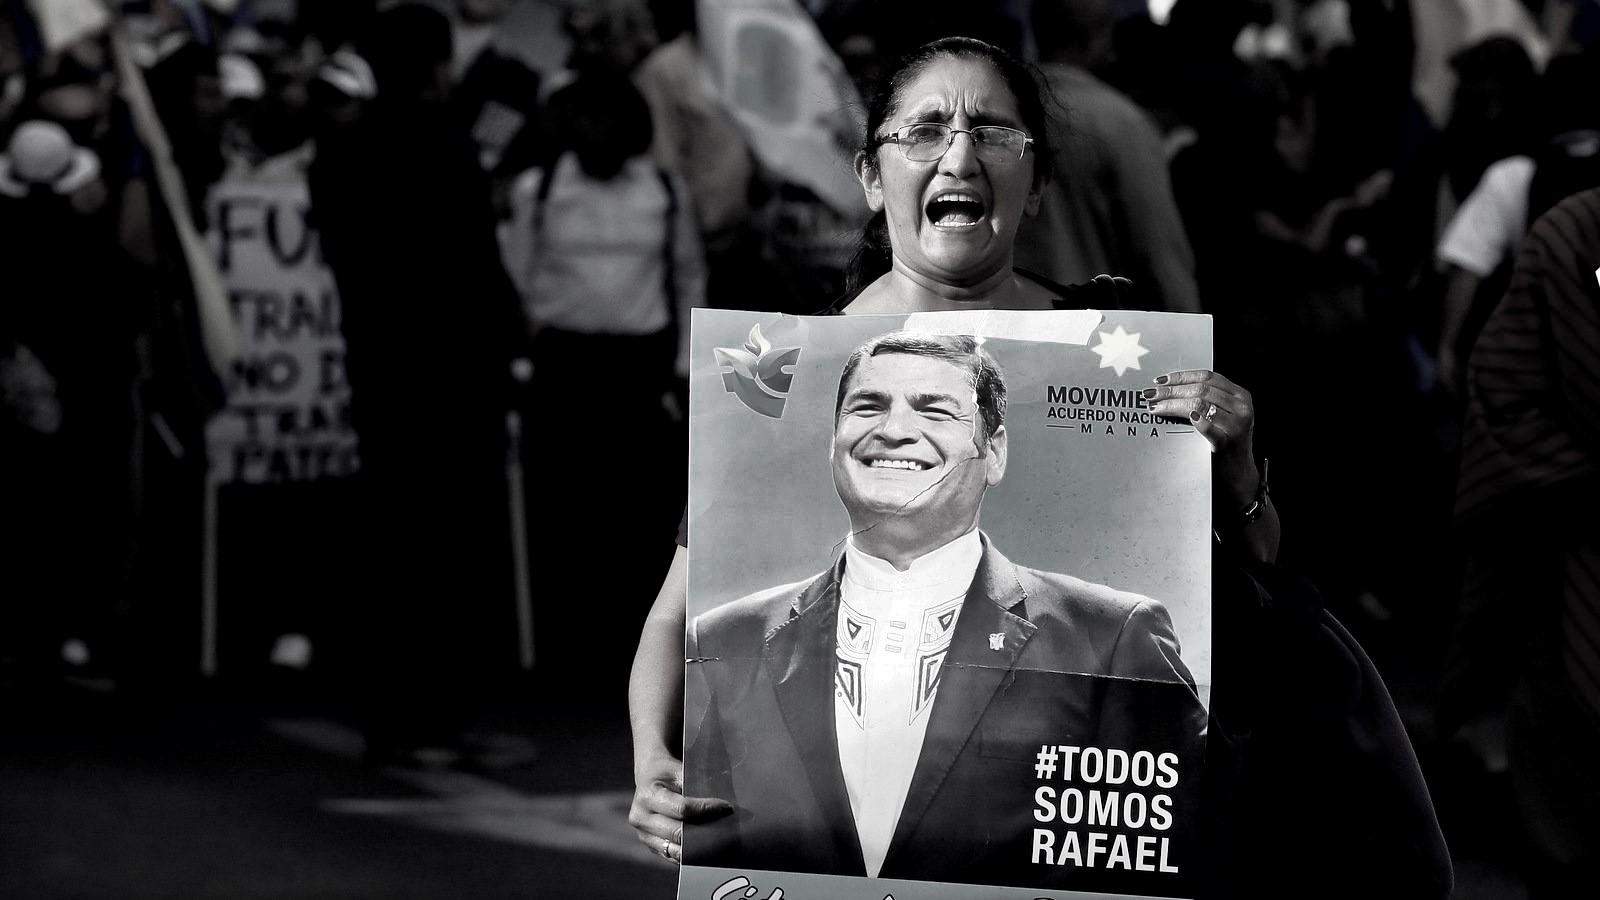 Revealing videos demonstrate Rafael Correa's innocence and procedural fraud against him